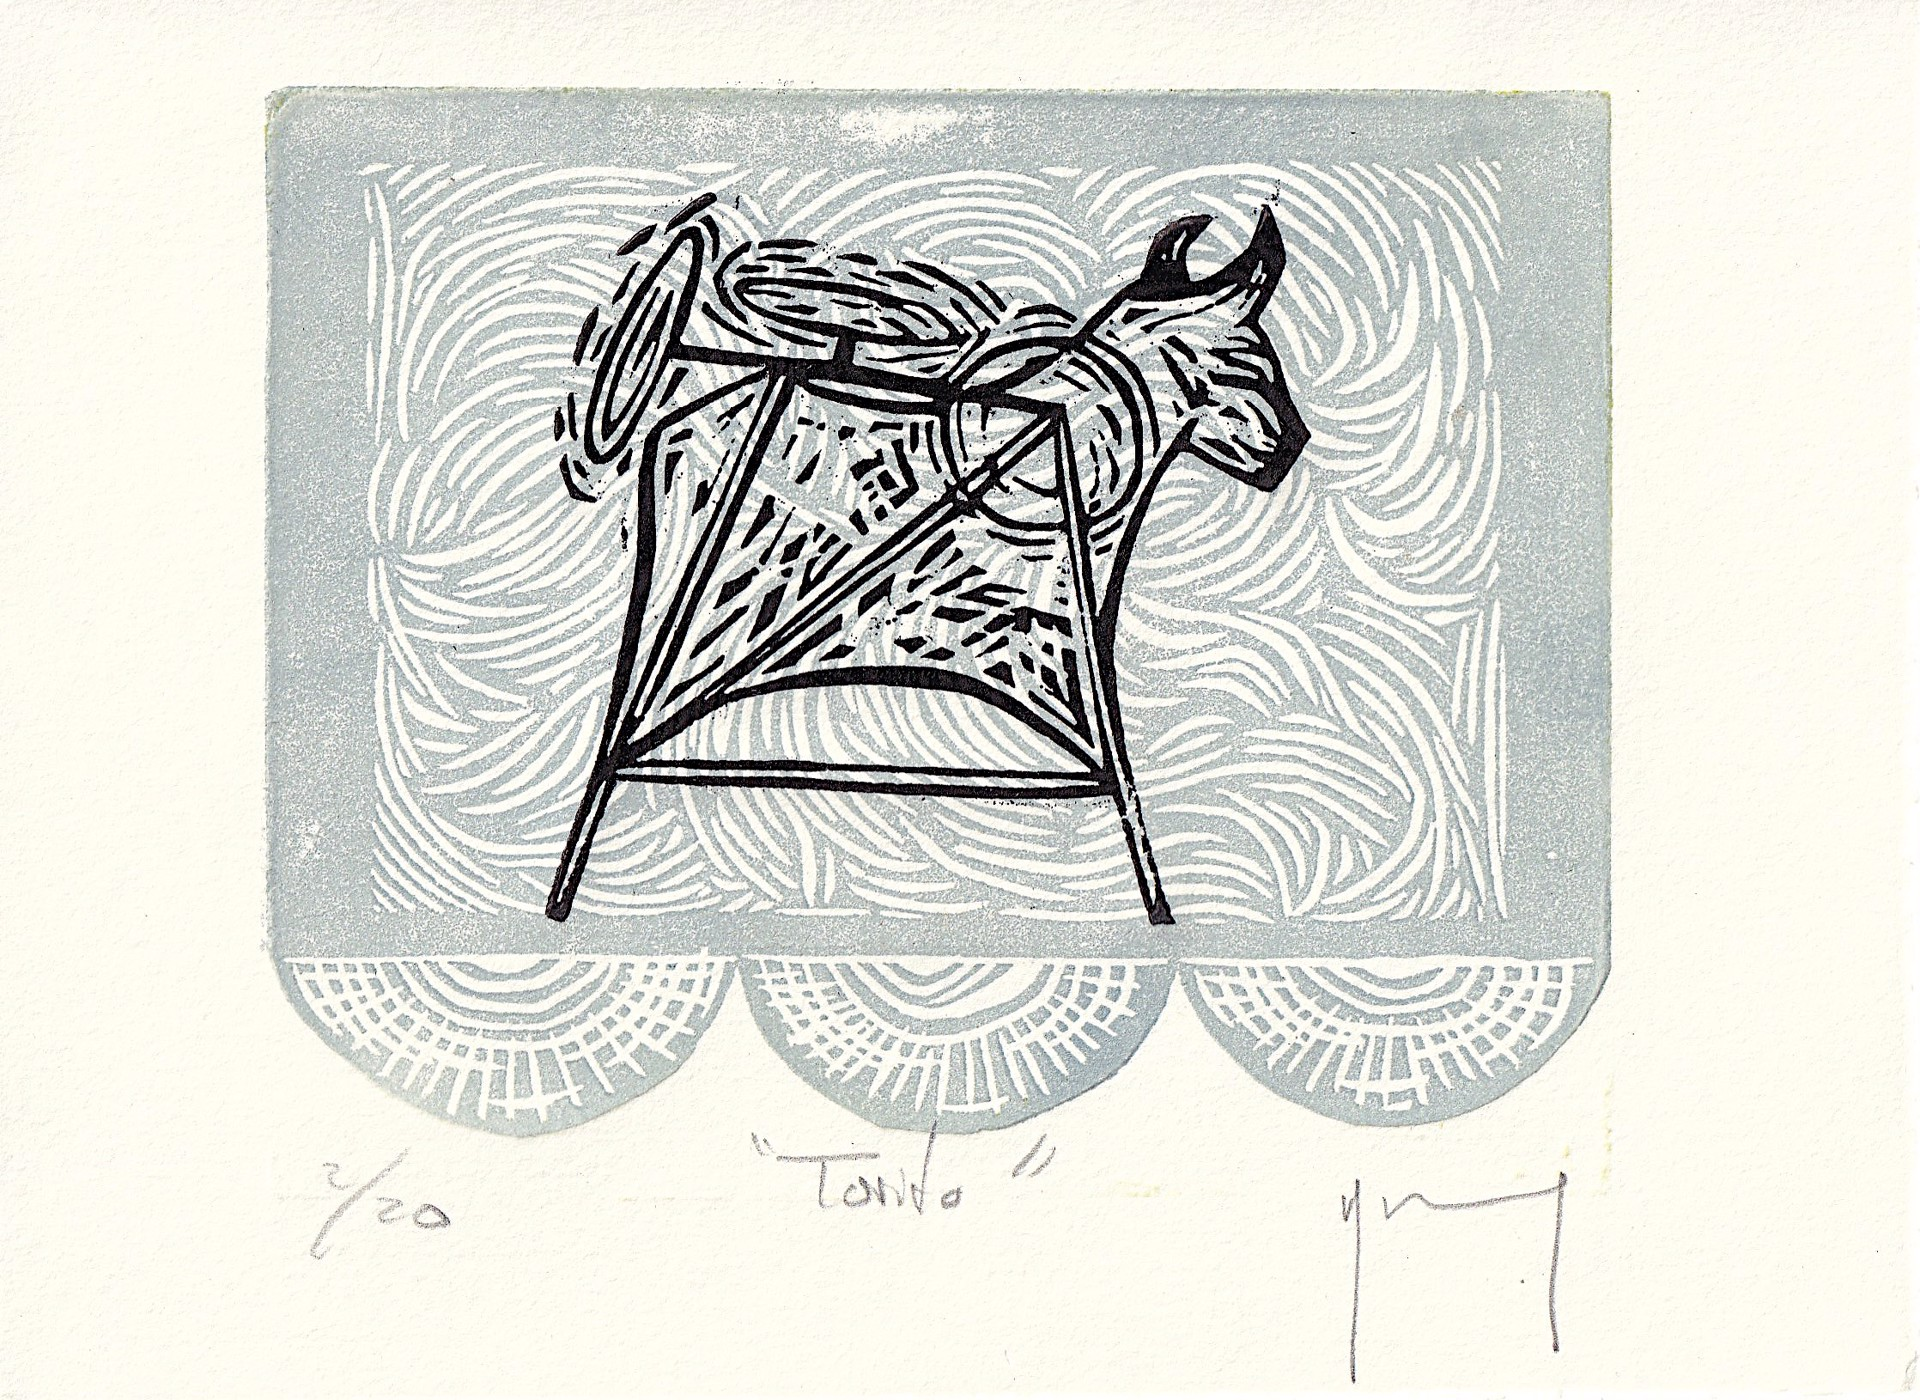 Serie Oaxaca (Torito) by Miguel Jimenez Martinez